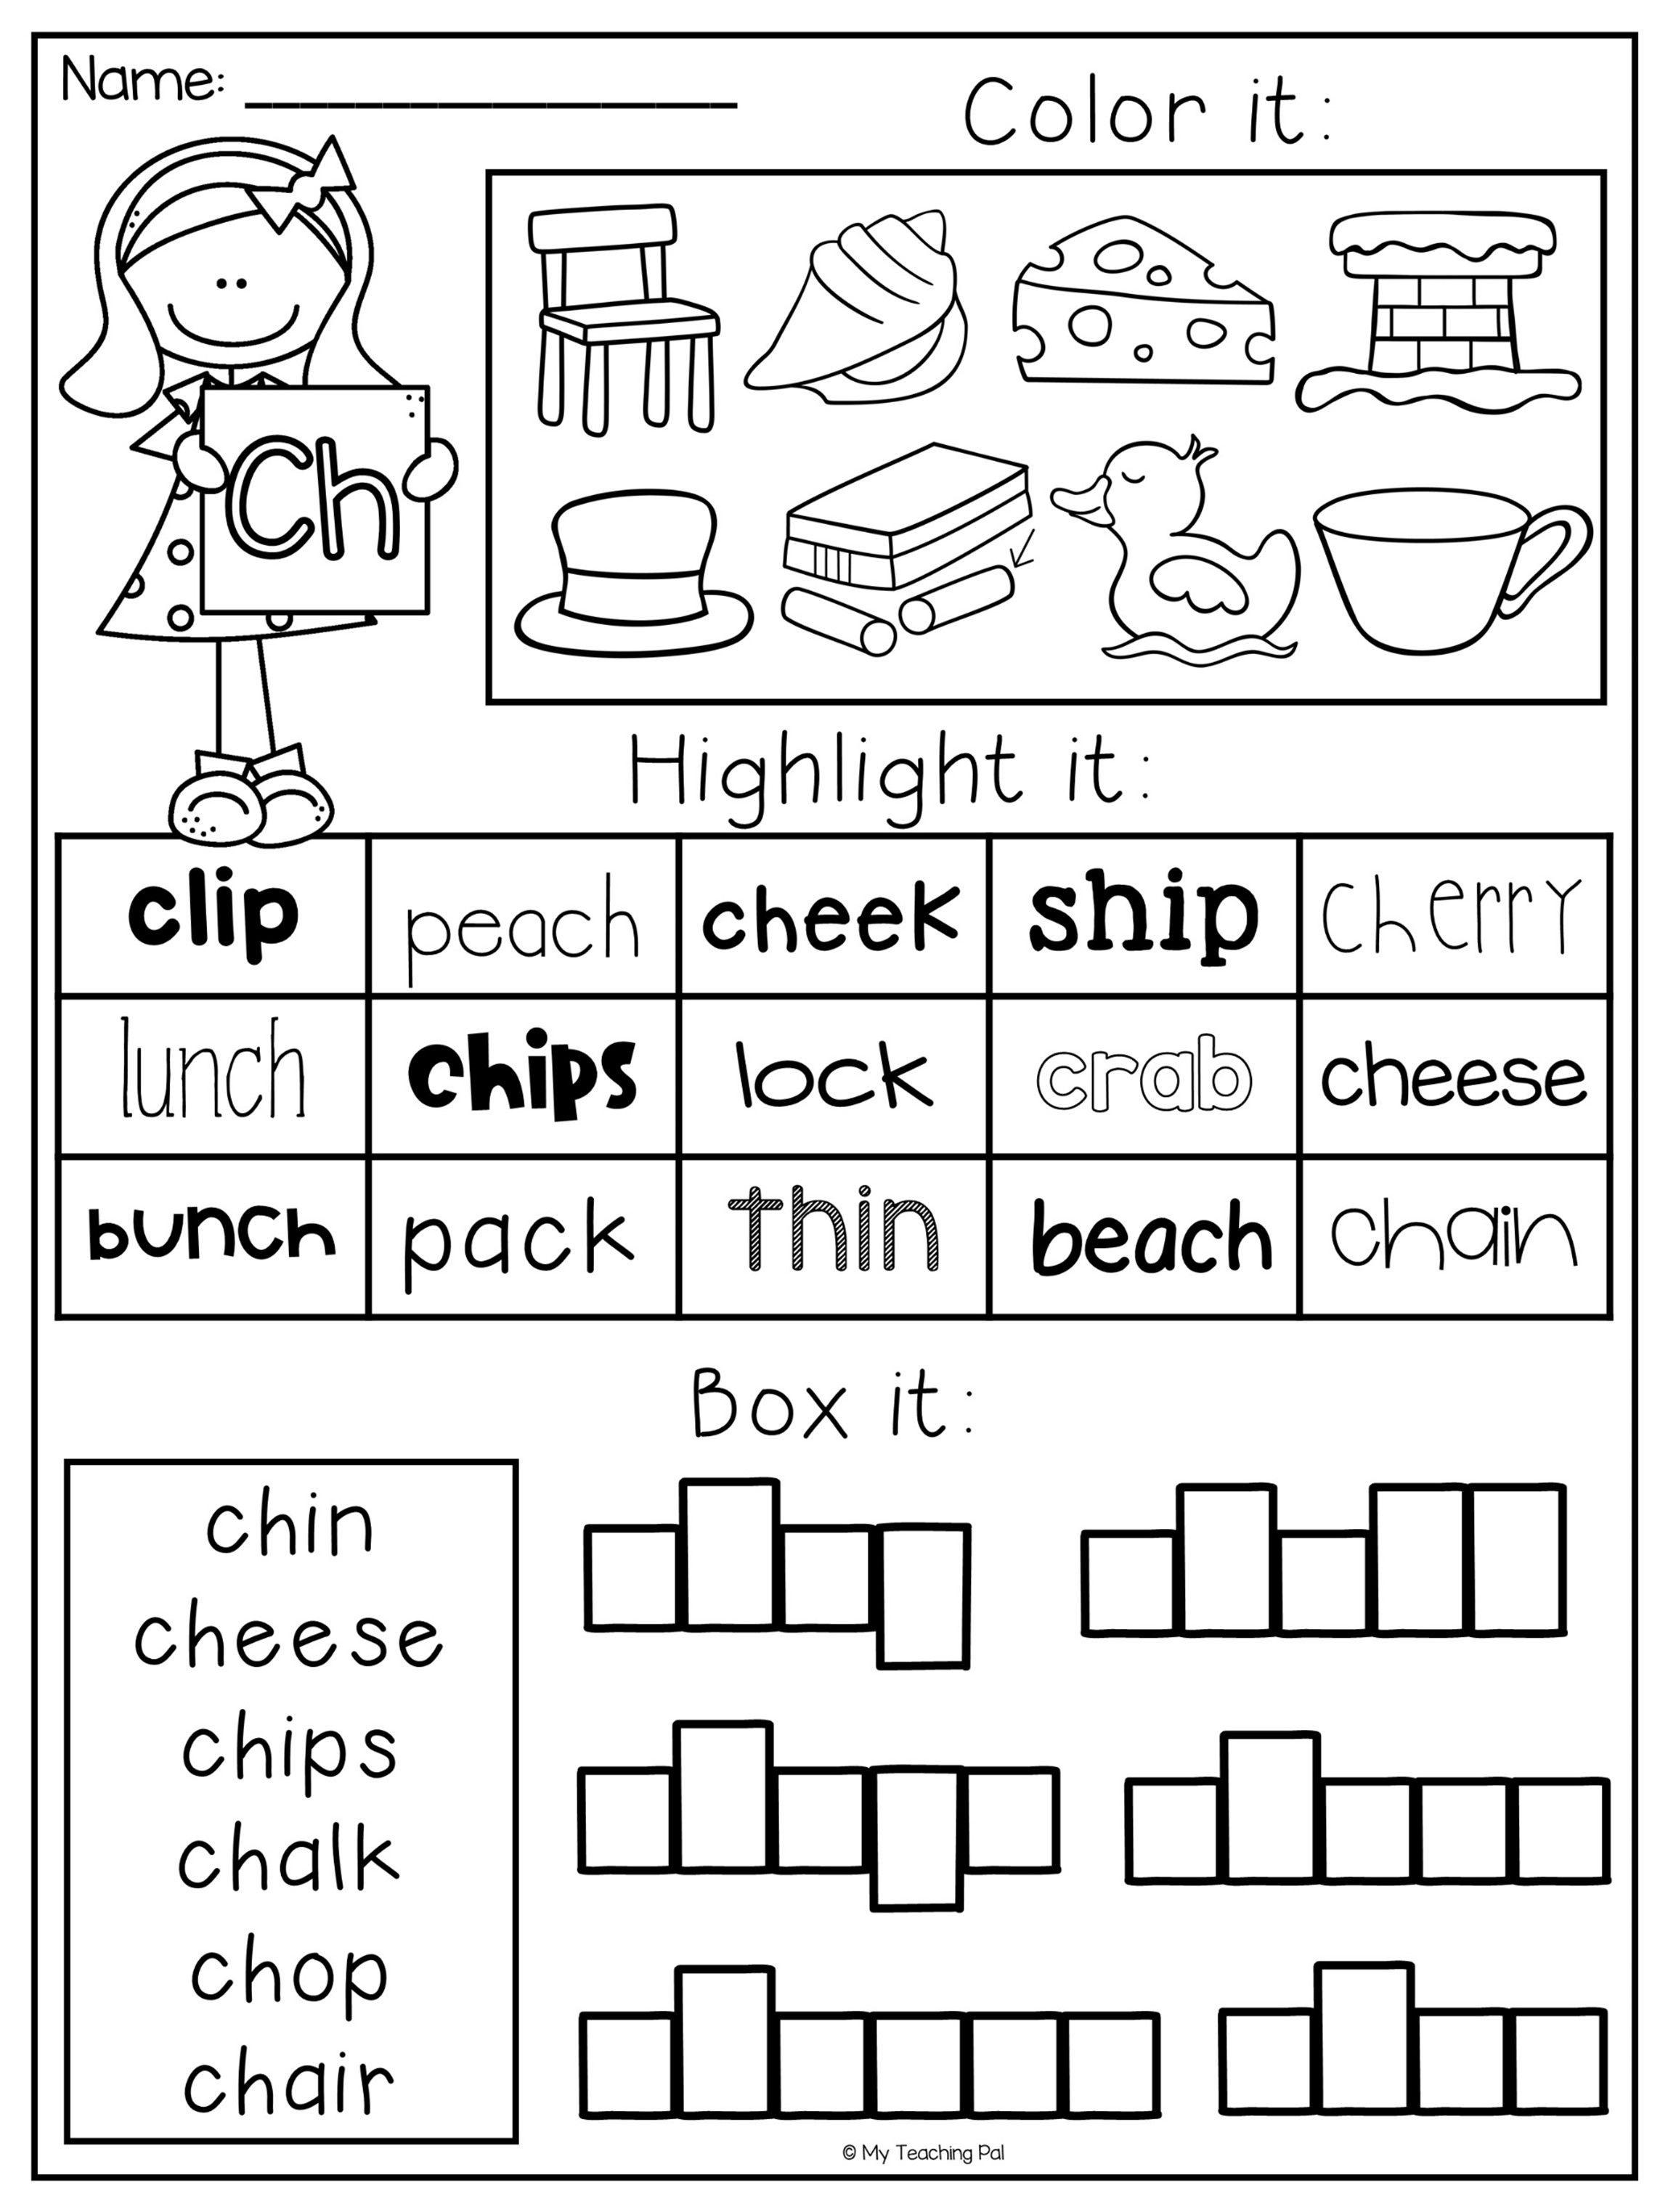 Digraph Worksheet Packet - Ch, Sh, Th, Wh, Ph   Educational - Sh Worksheets Free Printable